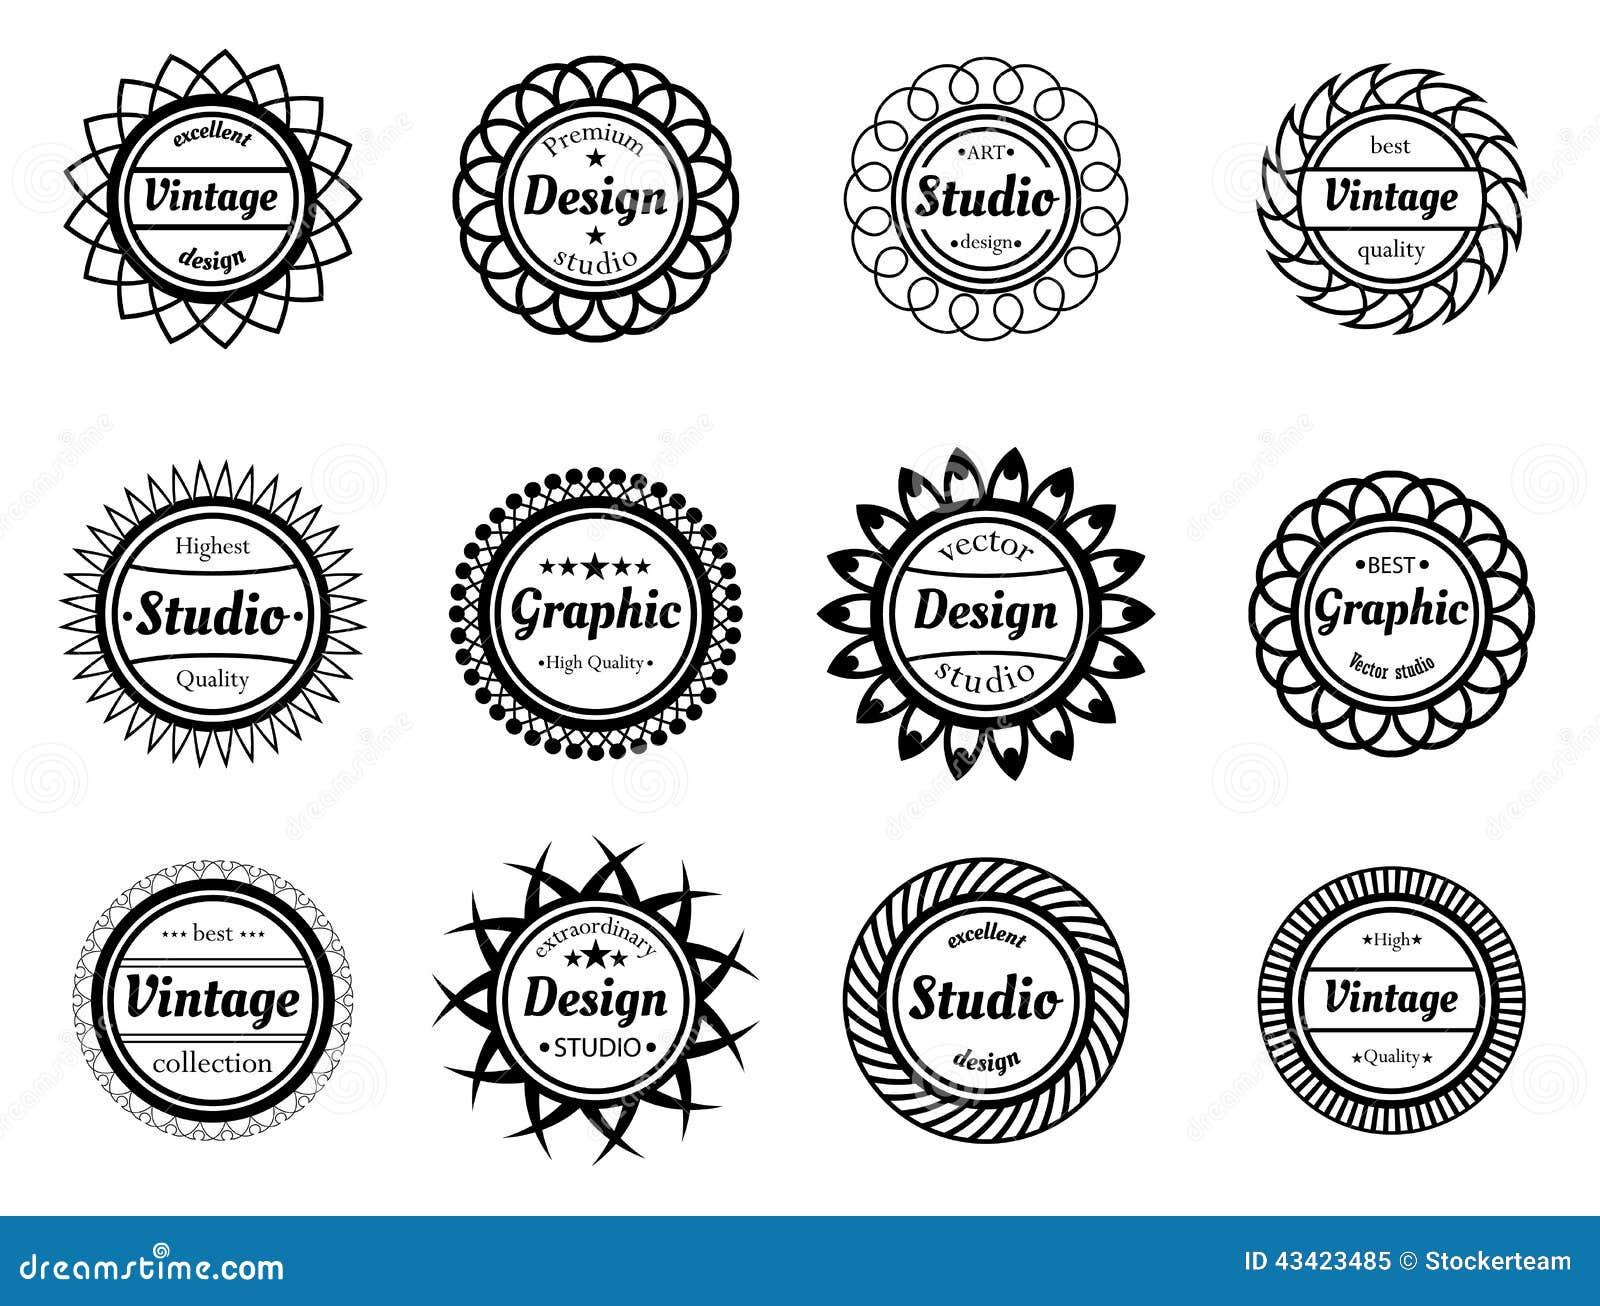 Stock Illustration Collection Award Stamp Design Adn Graphic Studios Image43423485